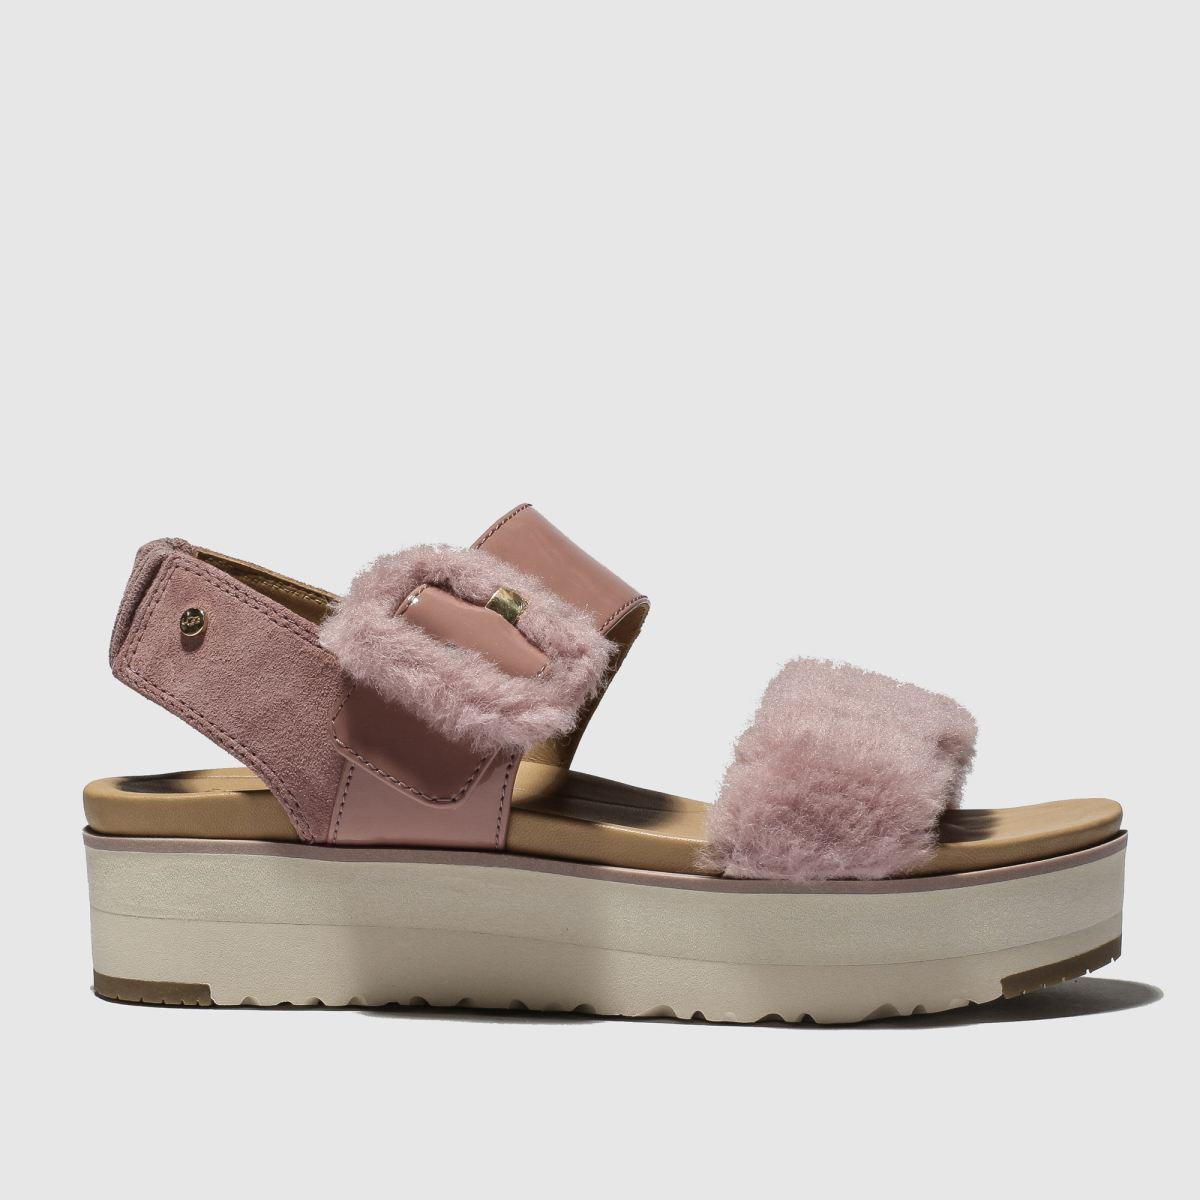 Ugg Pink Fluff Chella Sandals